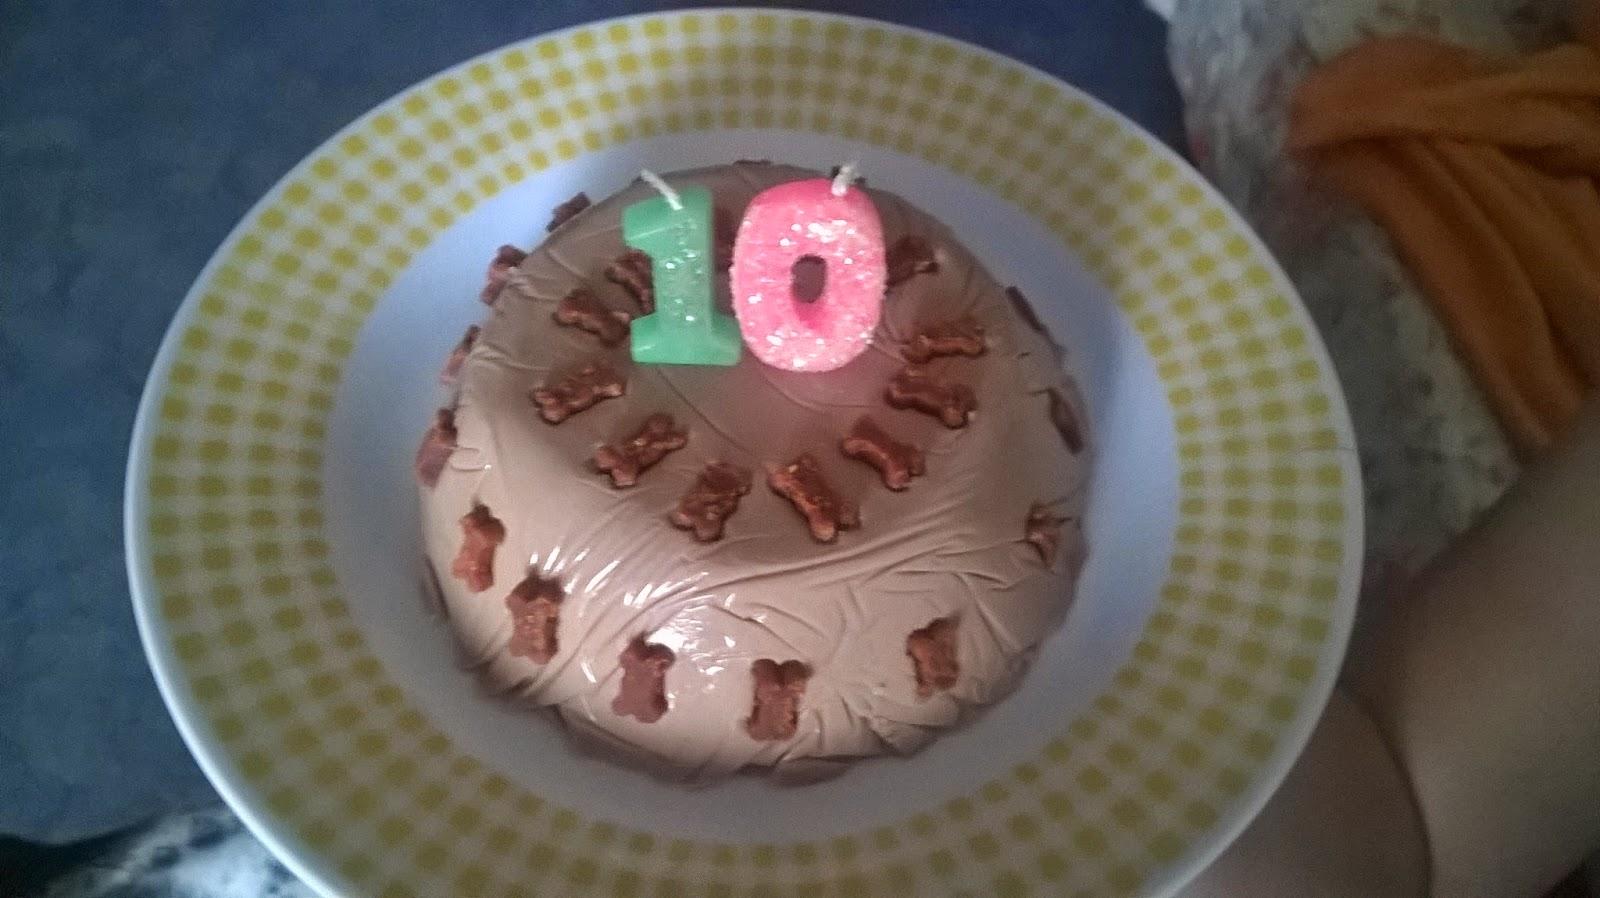 kutya torta képek Cesill recepttára: Egyszerű kutyatorta kutya torta képek